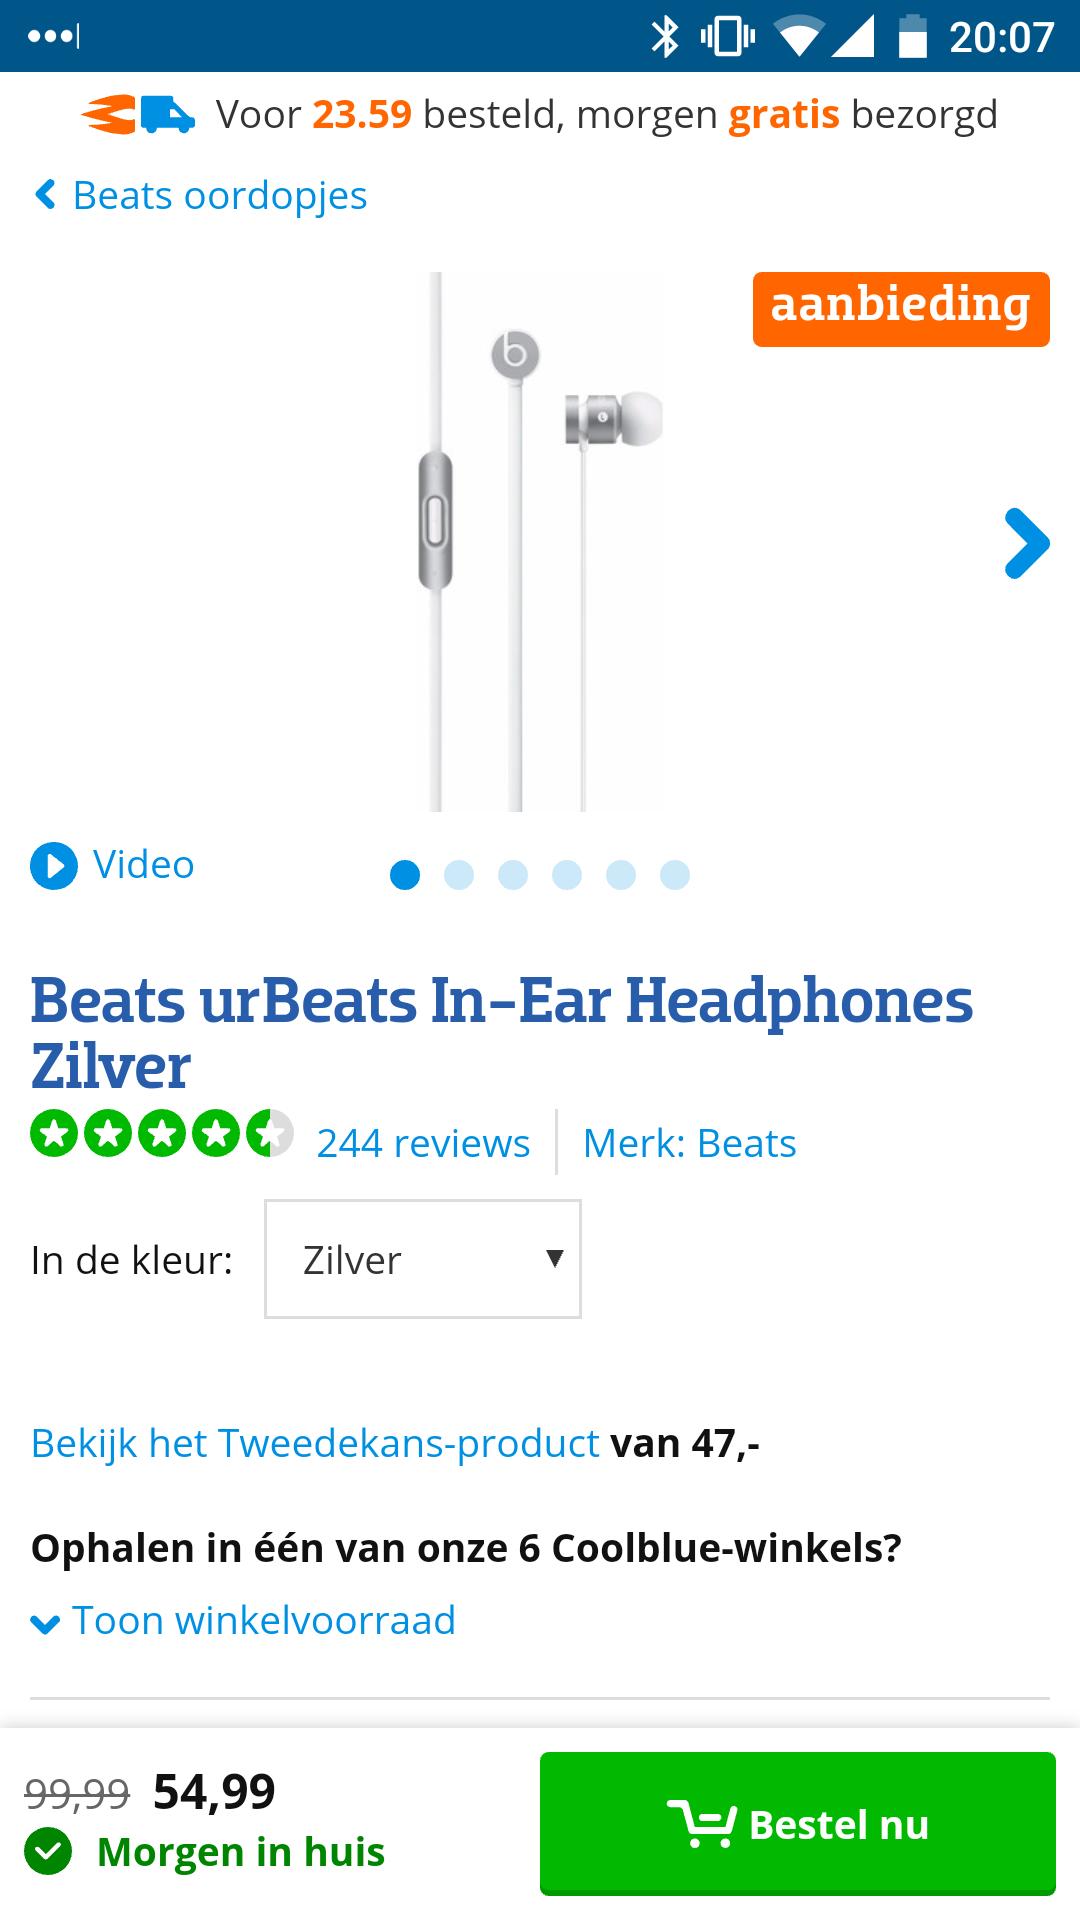 Beats urBeats  Headphonesby Dre